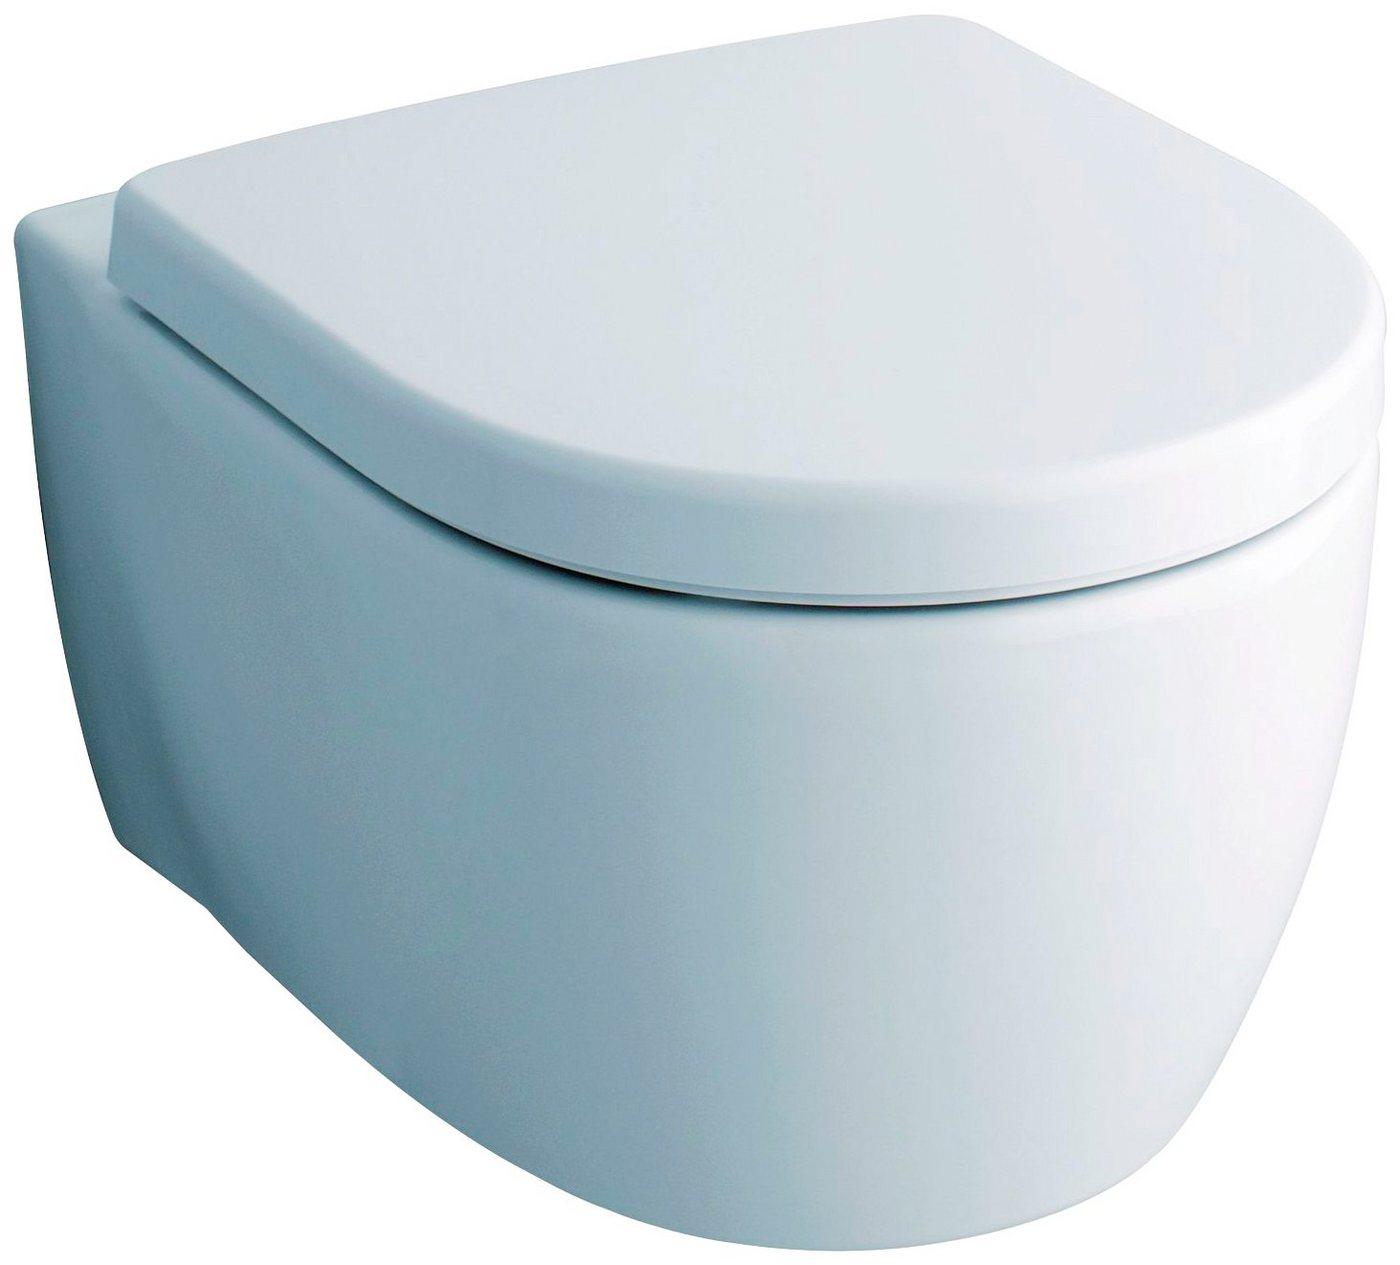 KERAMAG WC-Sitz »iCon« | Bad > WCs > WC-Becken | KERAMAG